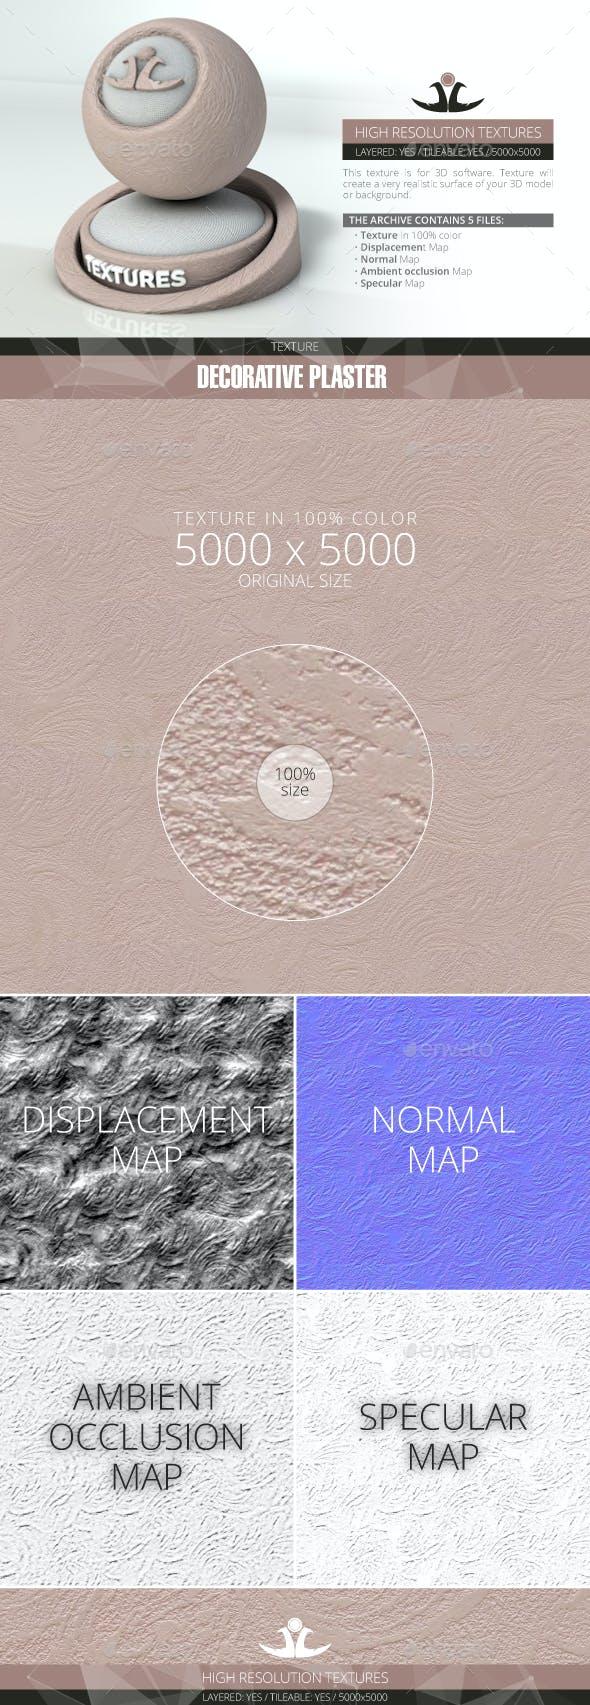 Decorative plaster 8 - 3DOcean Item for Sale